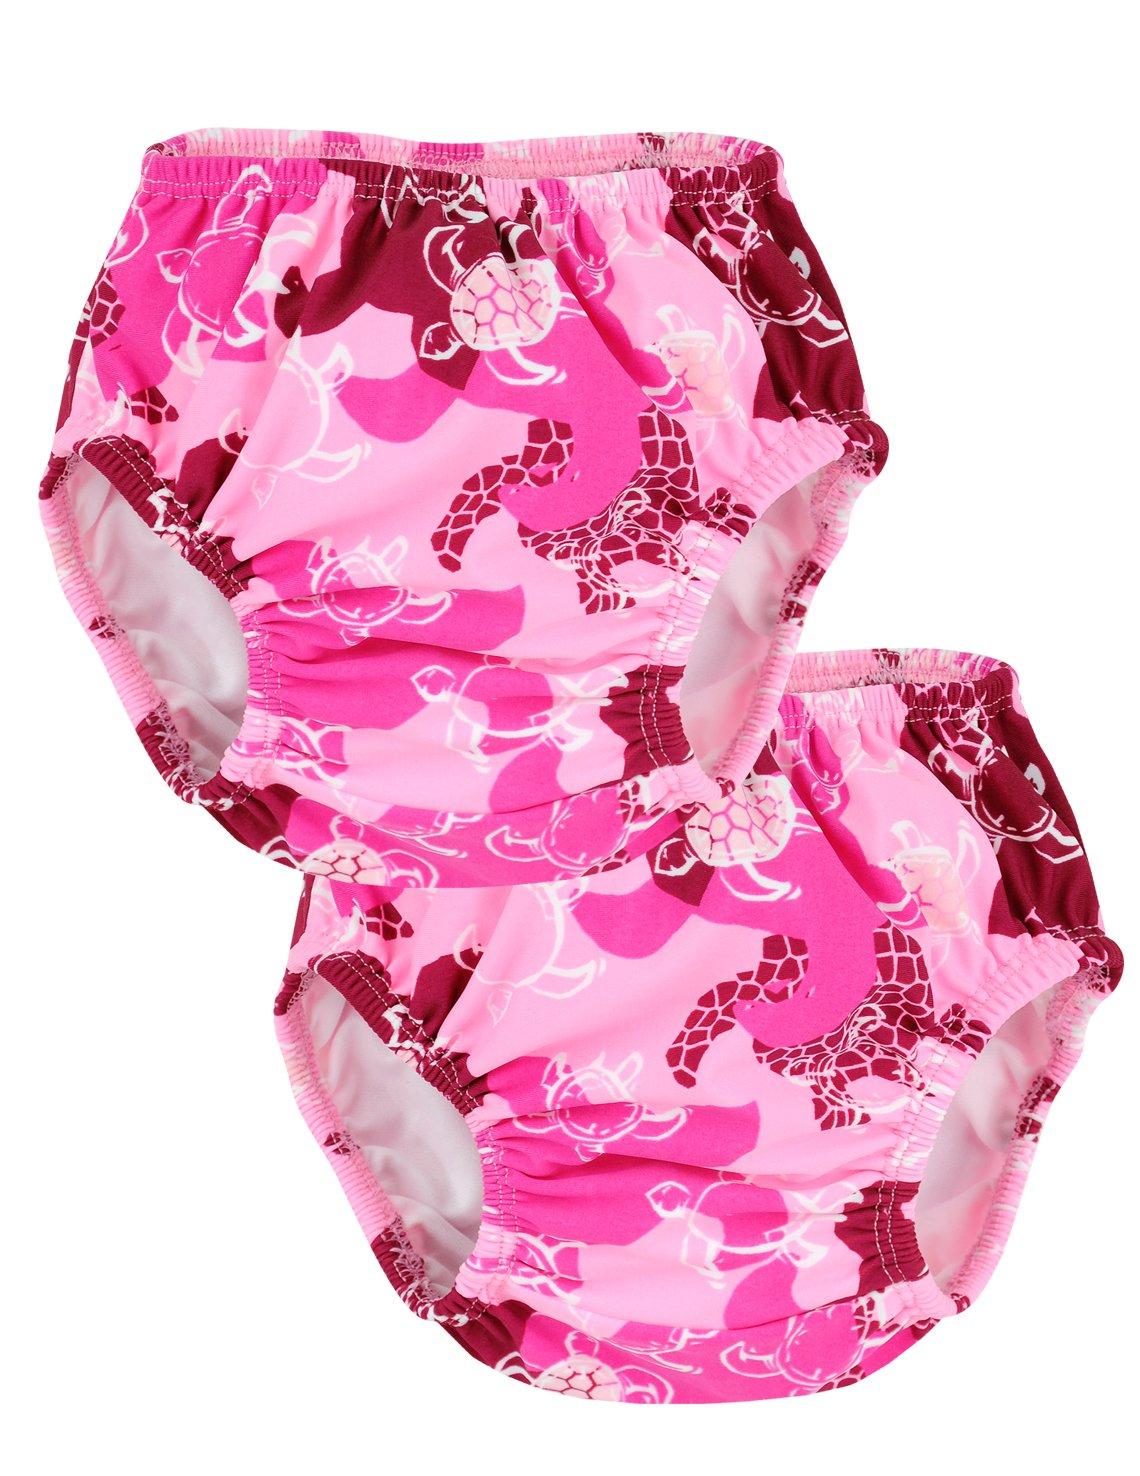 Tuga Girls Reusable Swim Diapers 2-Pack, Peoni, Small